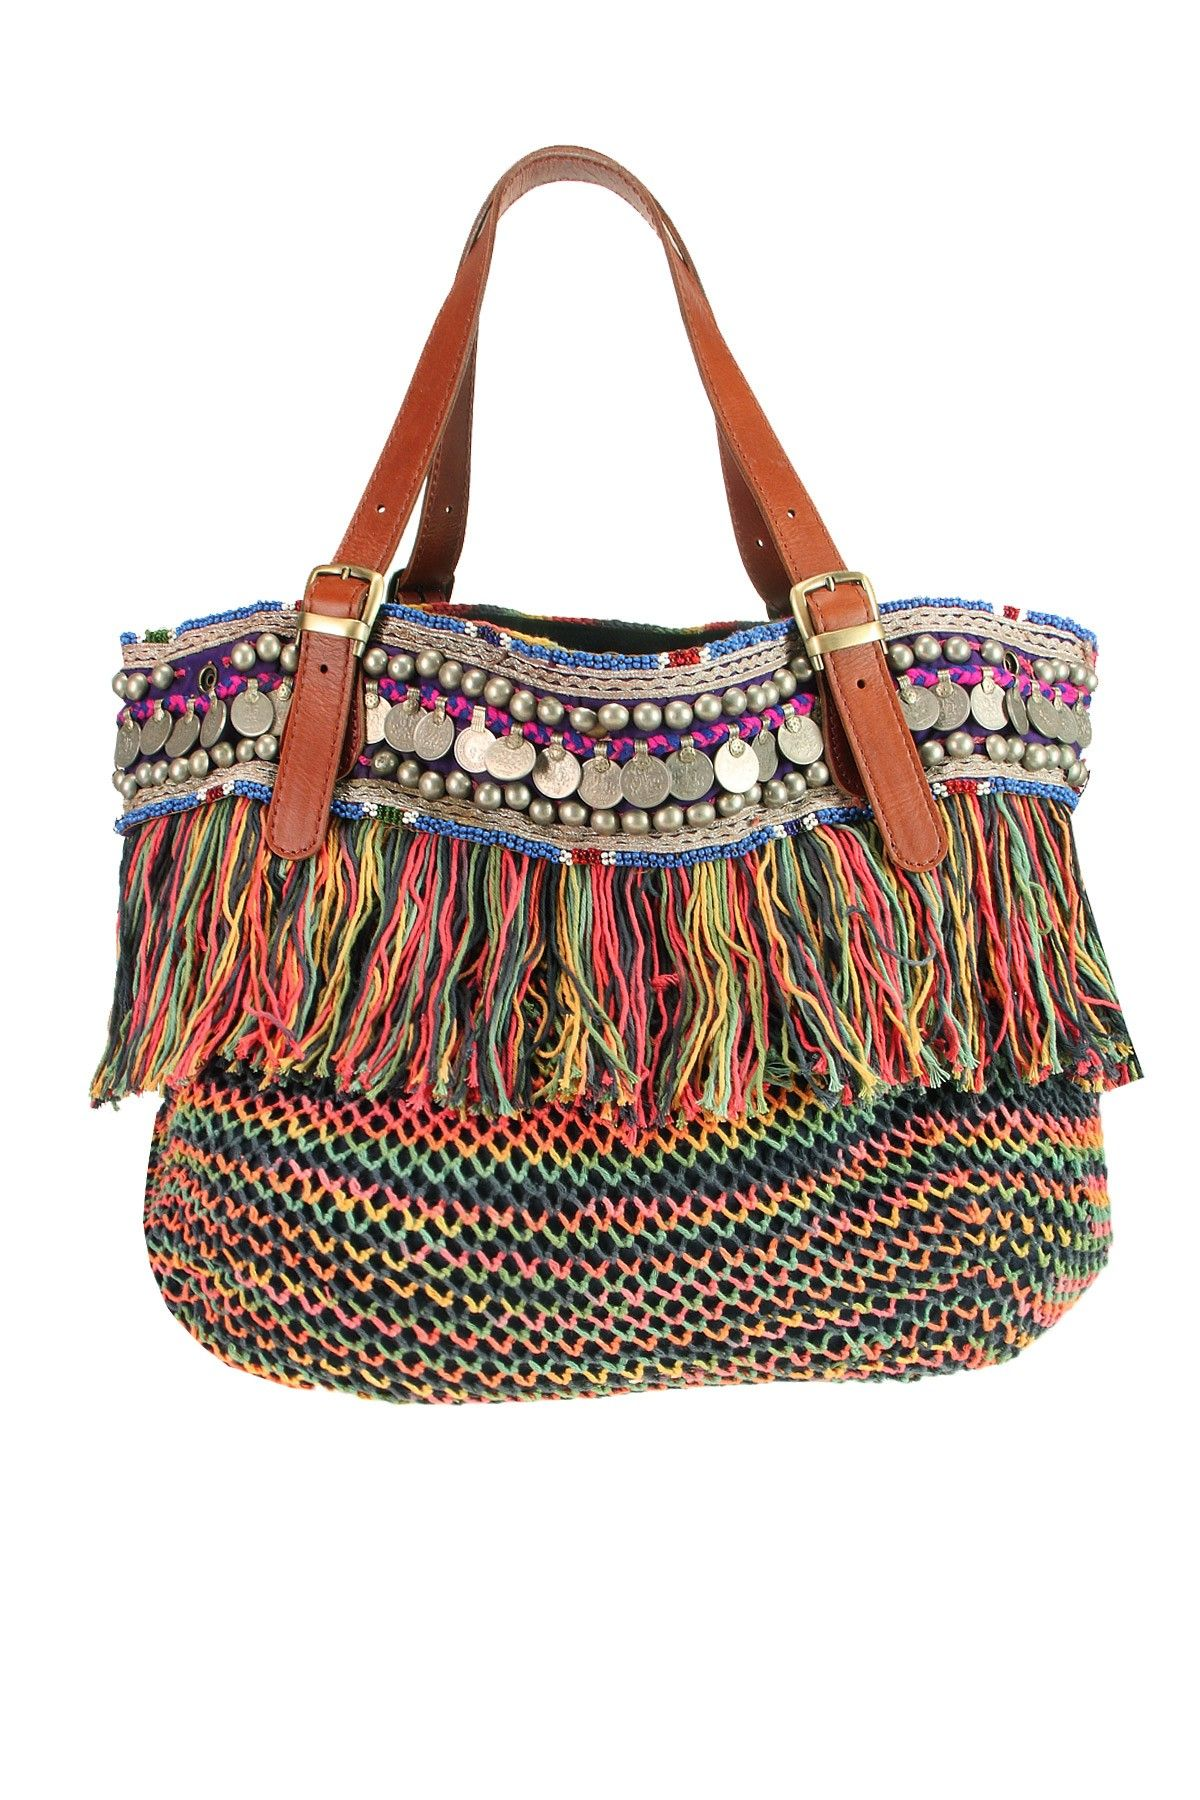 Indie Bag, ELLIOT MANN, Winter 2012